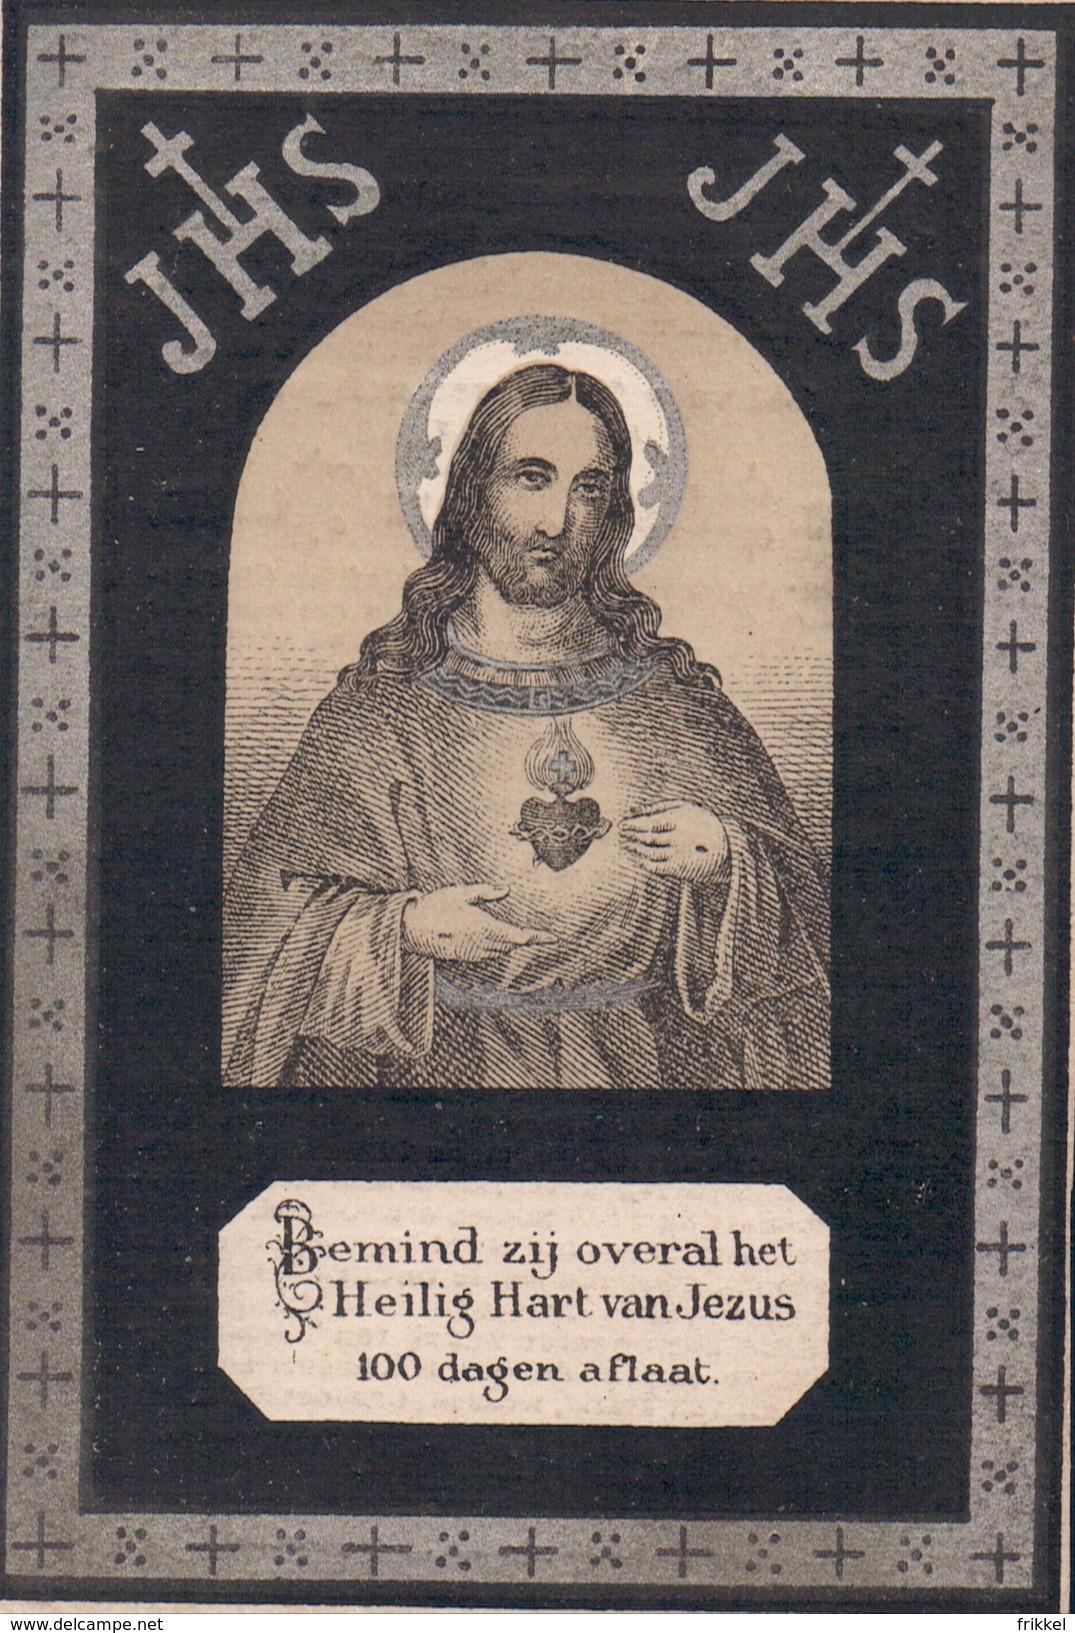 Oud Doodsprentje Retie Rethy 1891 Anna Sidonia Juliana Mertens Holy Card - Devotion Images